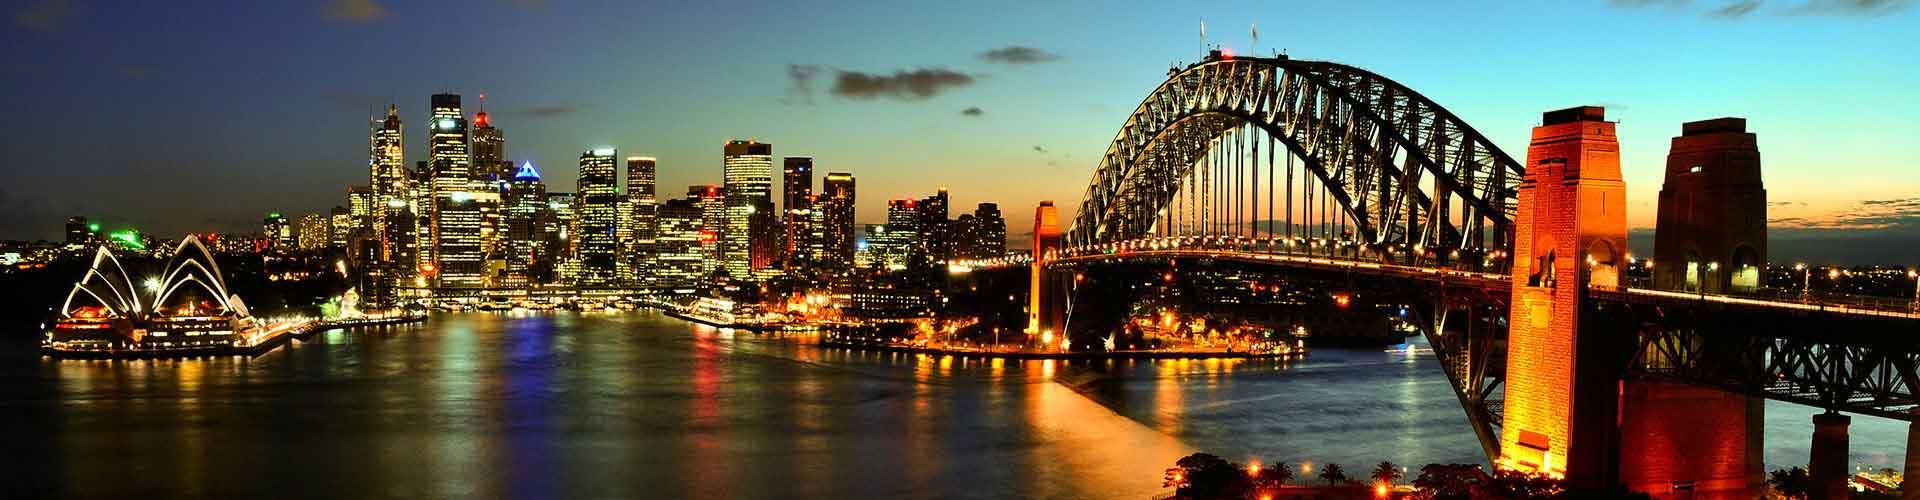 Sydney – Camere a Sydney. Mappe per Sydney, Foto e  Recensioni per ogni Camera a Sydney.